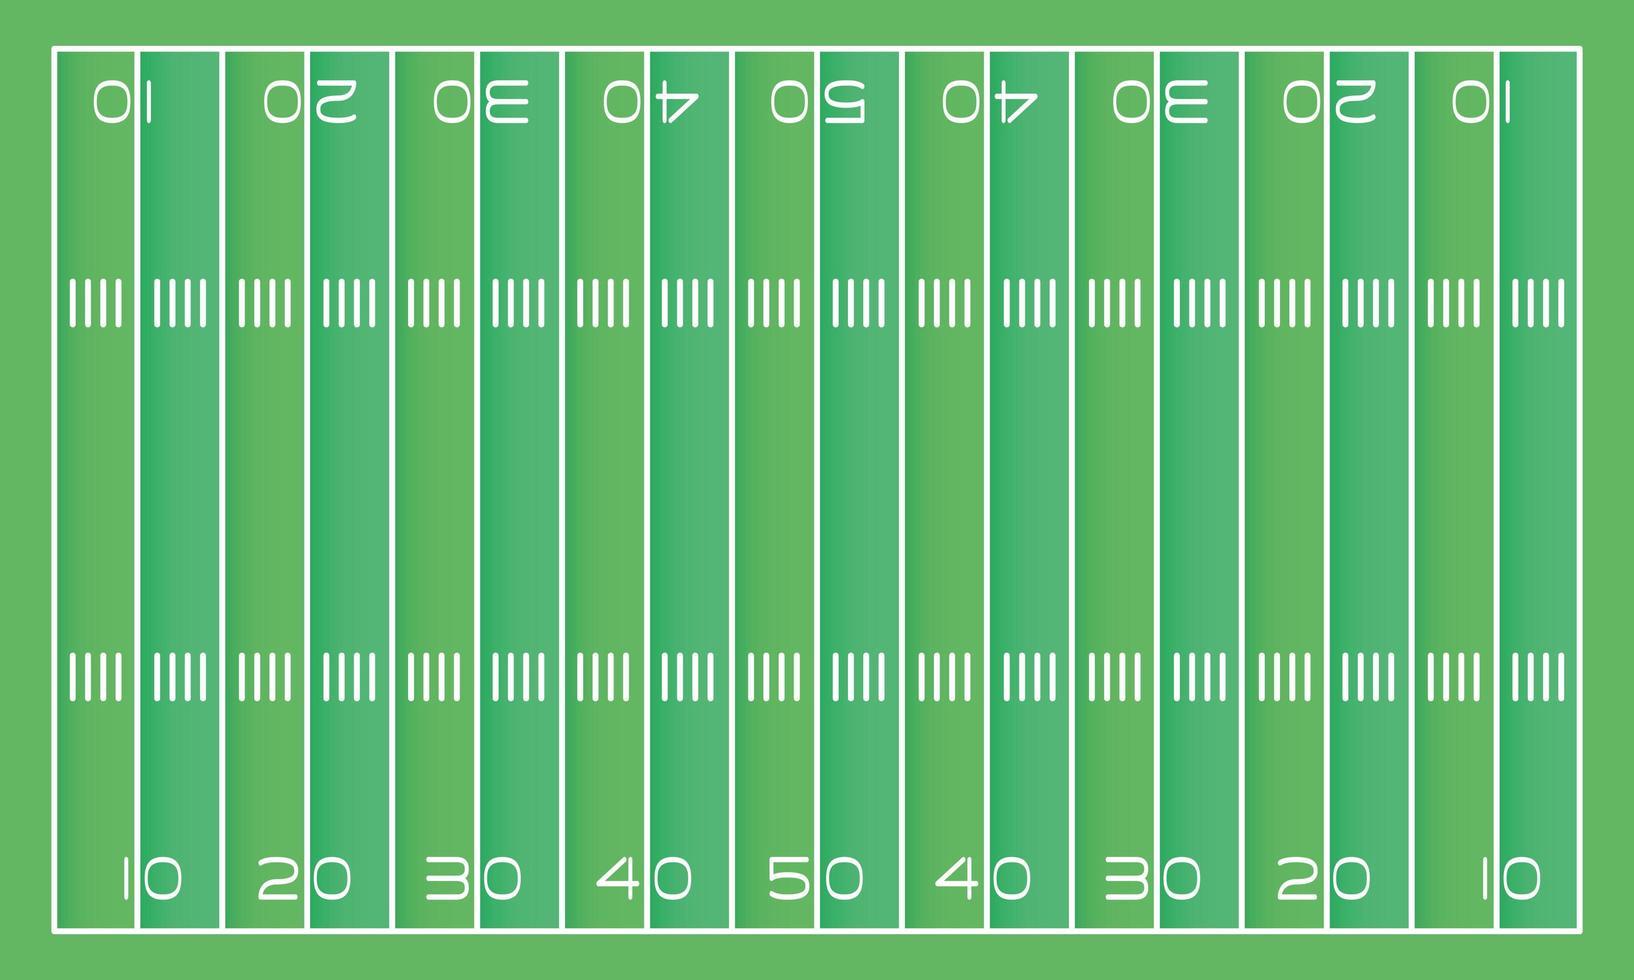 American-Football-Feldszenenikone vektor